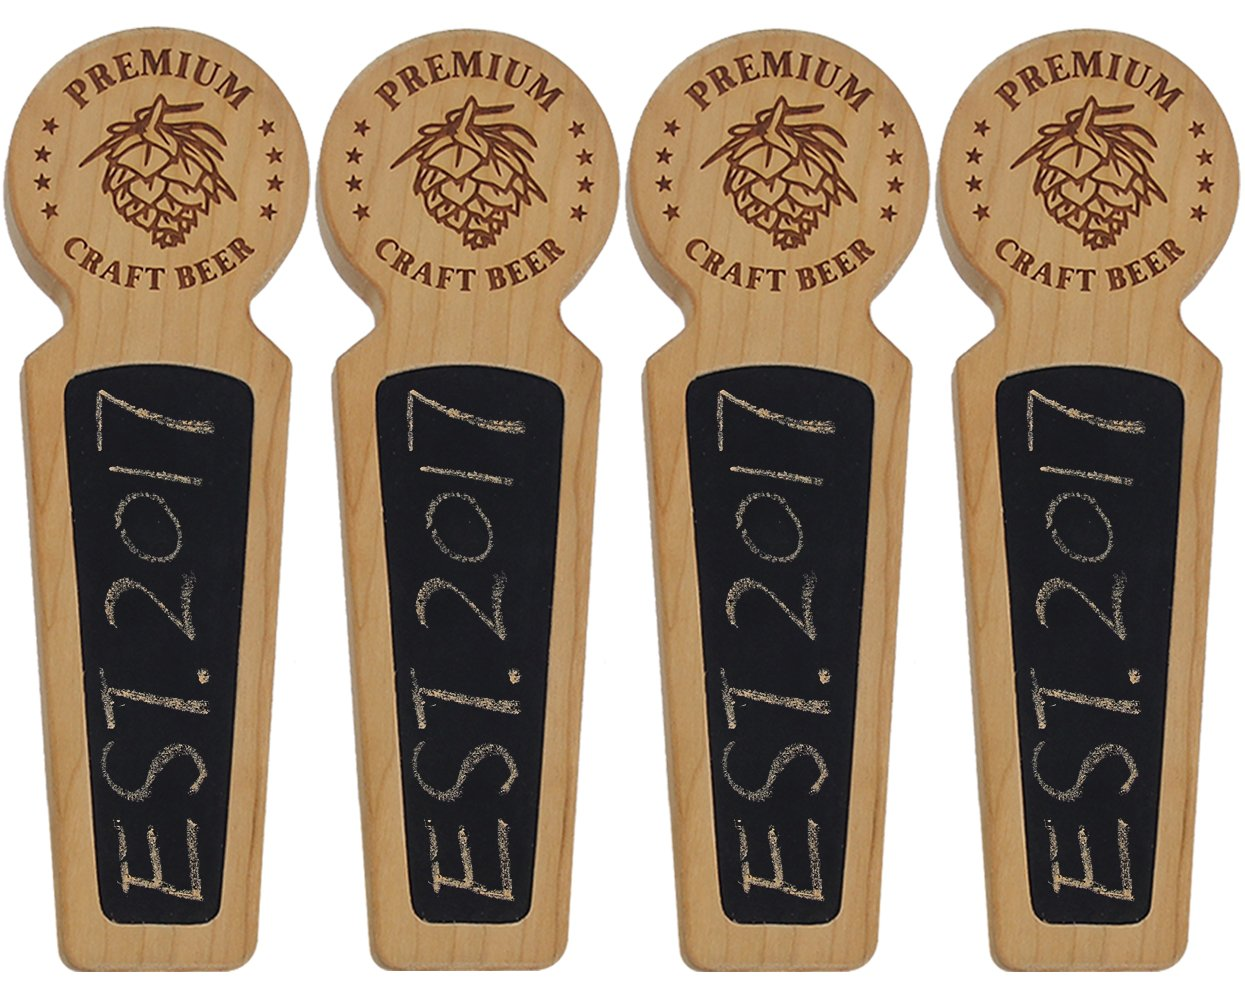 Awofer Set Of 4-40 Wood tap handle for kegerator, Chalkboard beer keg tap handle with laser engraved pine nuts logo, Premium Craft Beer, 8.3 INCH Long Cherry Wood, Craft beer gifts …